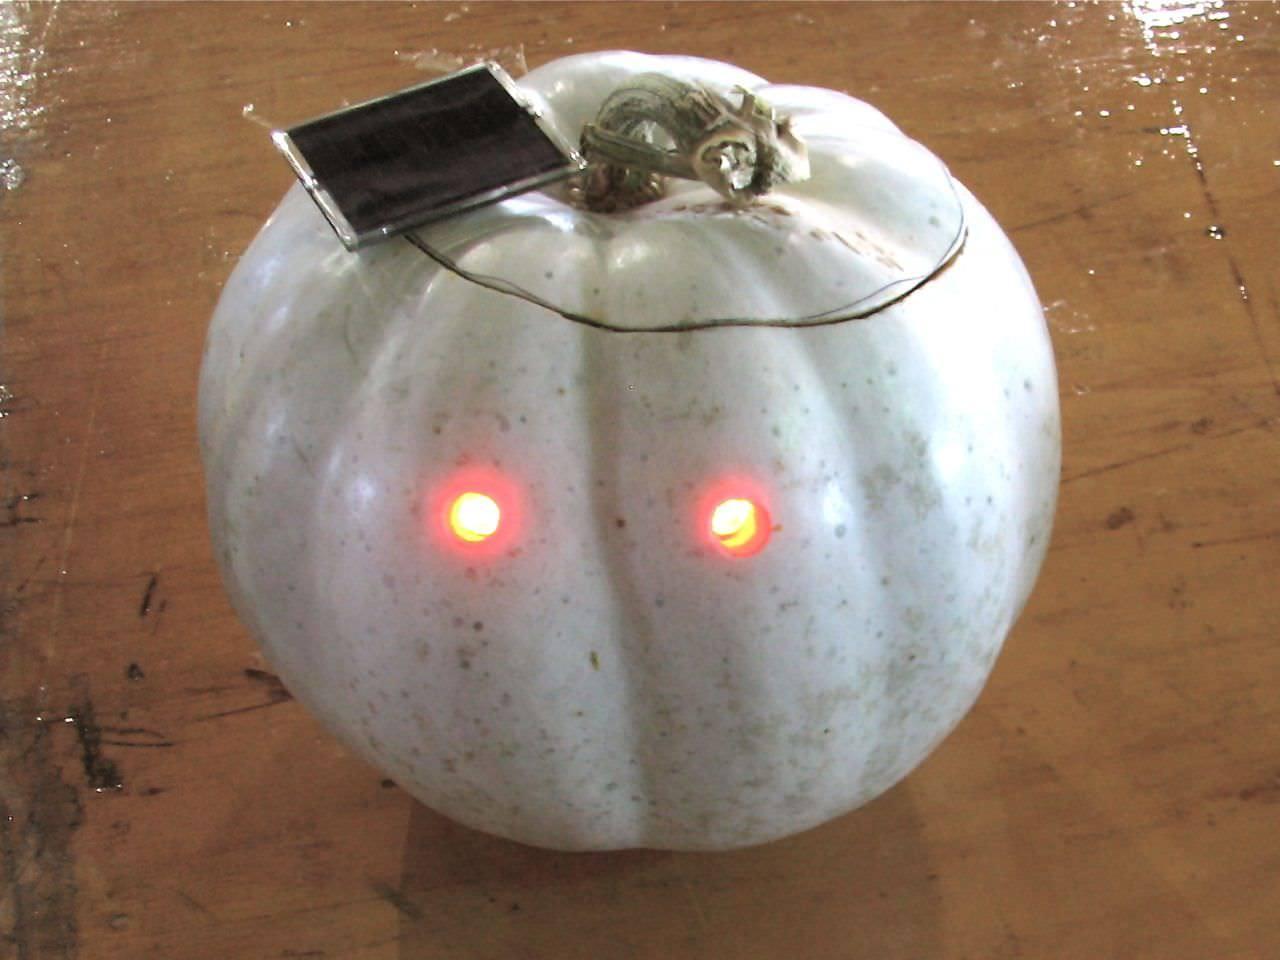 A solar pumpkin. By Lenore Edman, flickr user lenore-m